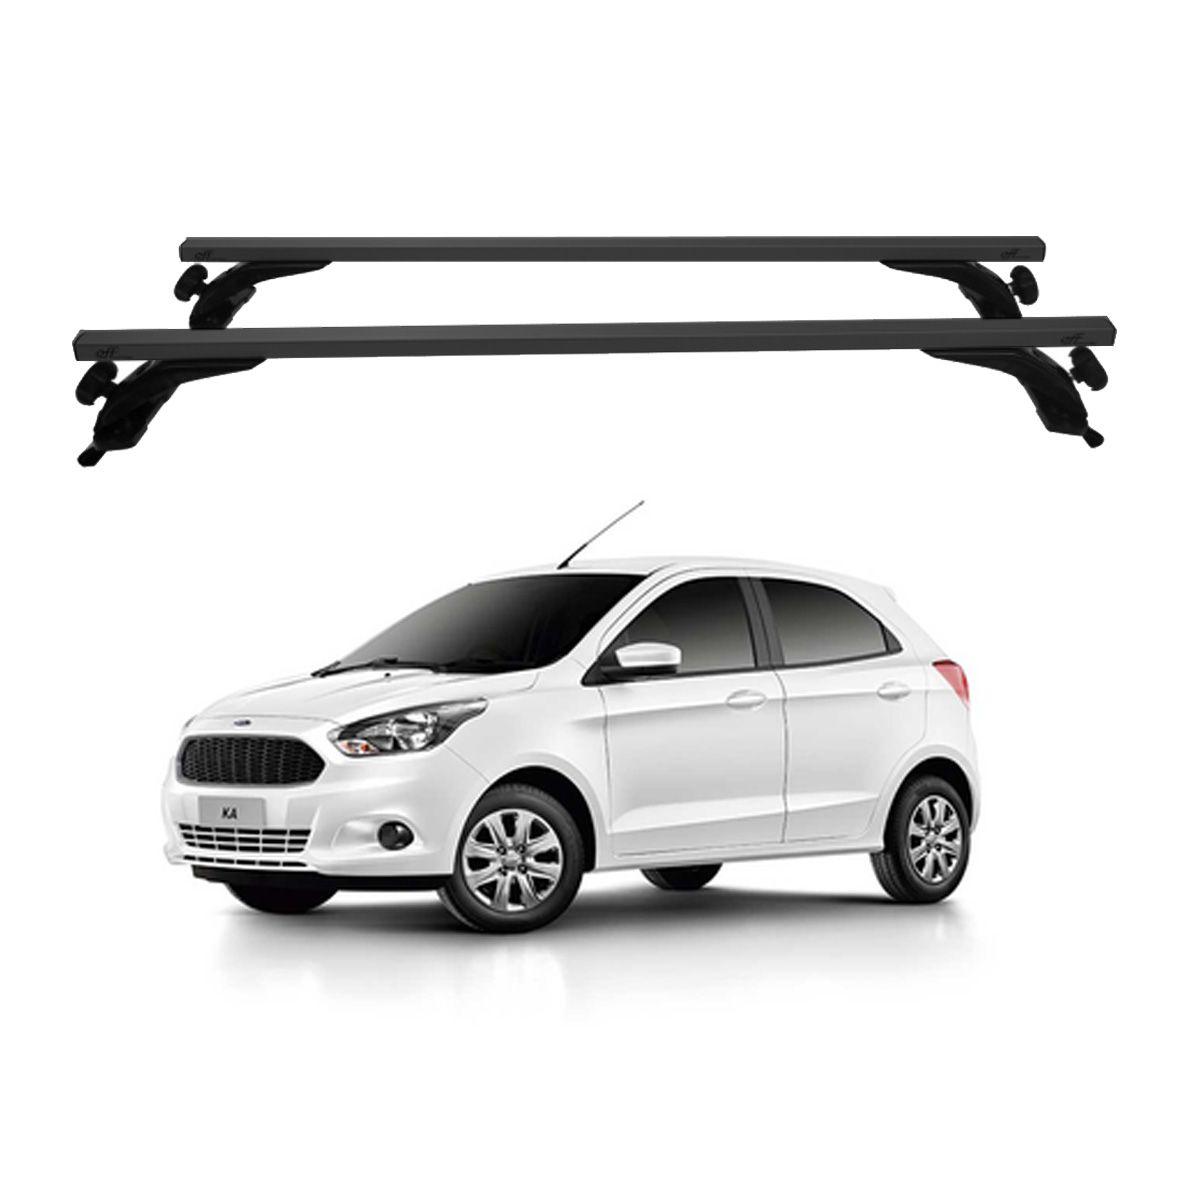 Rack Travessa de Teto Alumínio Preto Ford Ka